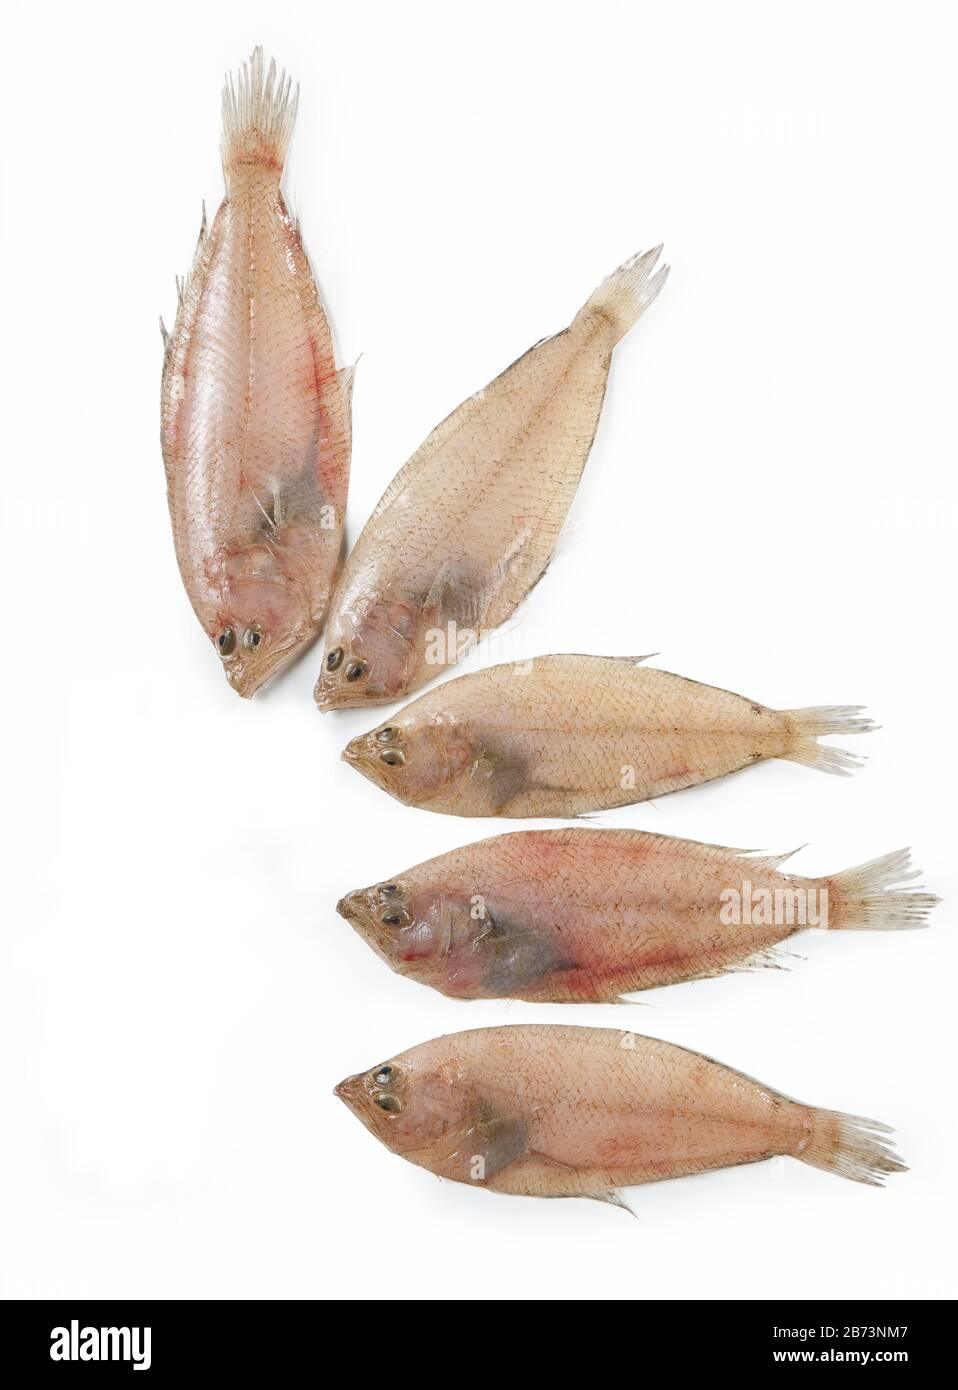 European flounder, Flatfish, Platichthys flesus, Pande, mediterranean fish, isolate on white background Stock Photo